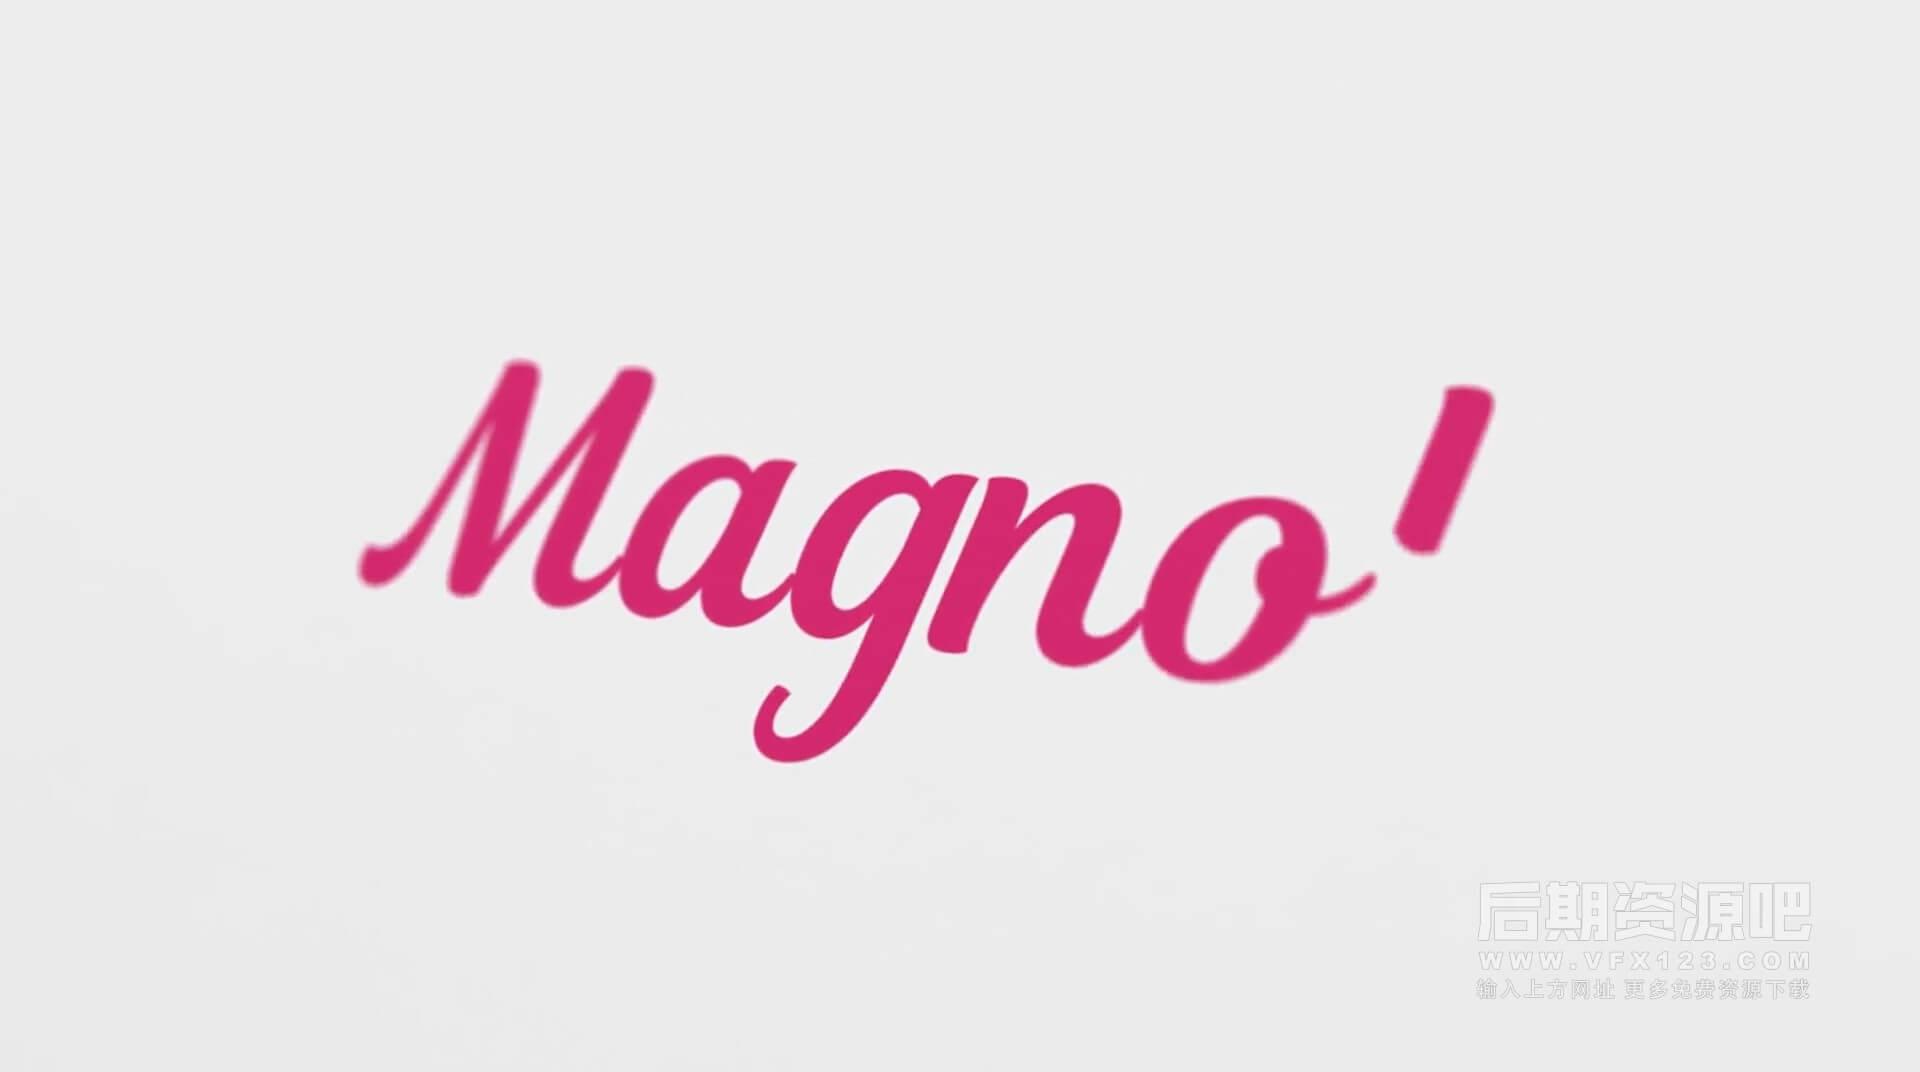 Fcpx插件 英文手写标题字幕 Vlog常用大标题模板 Magnolia Animated Typeface